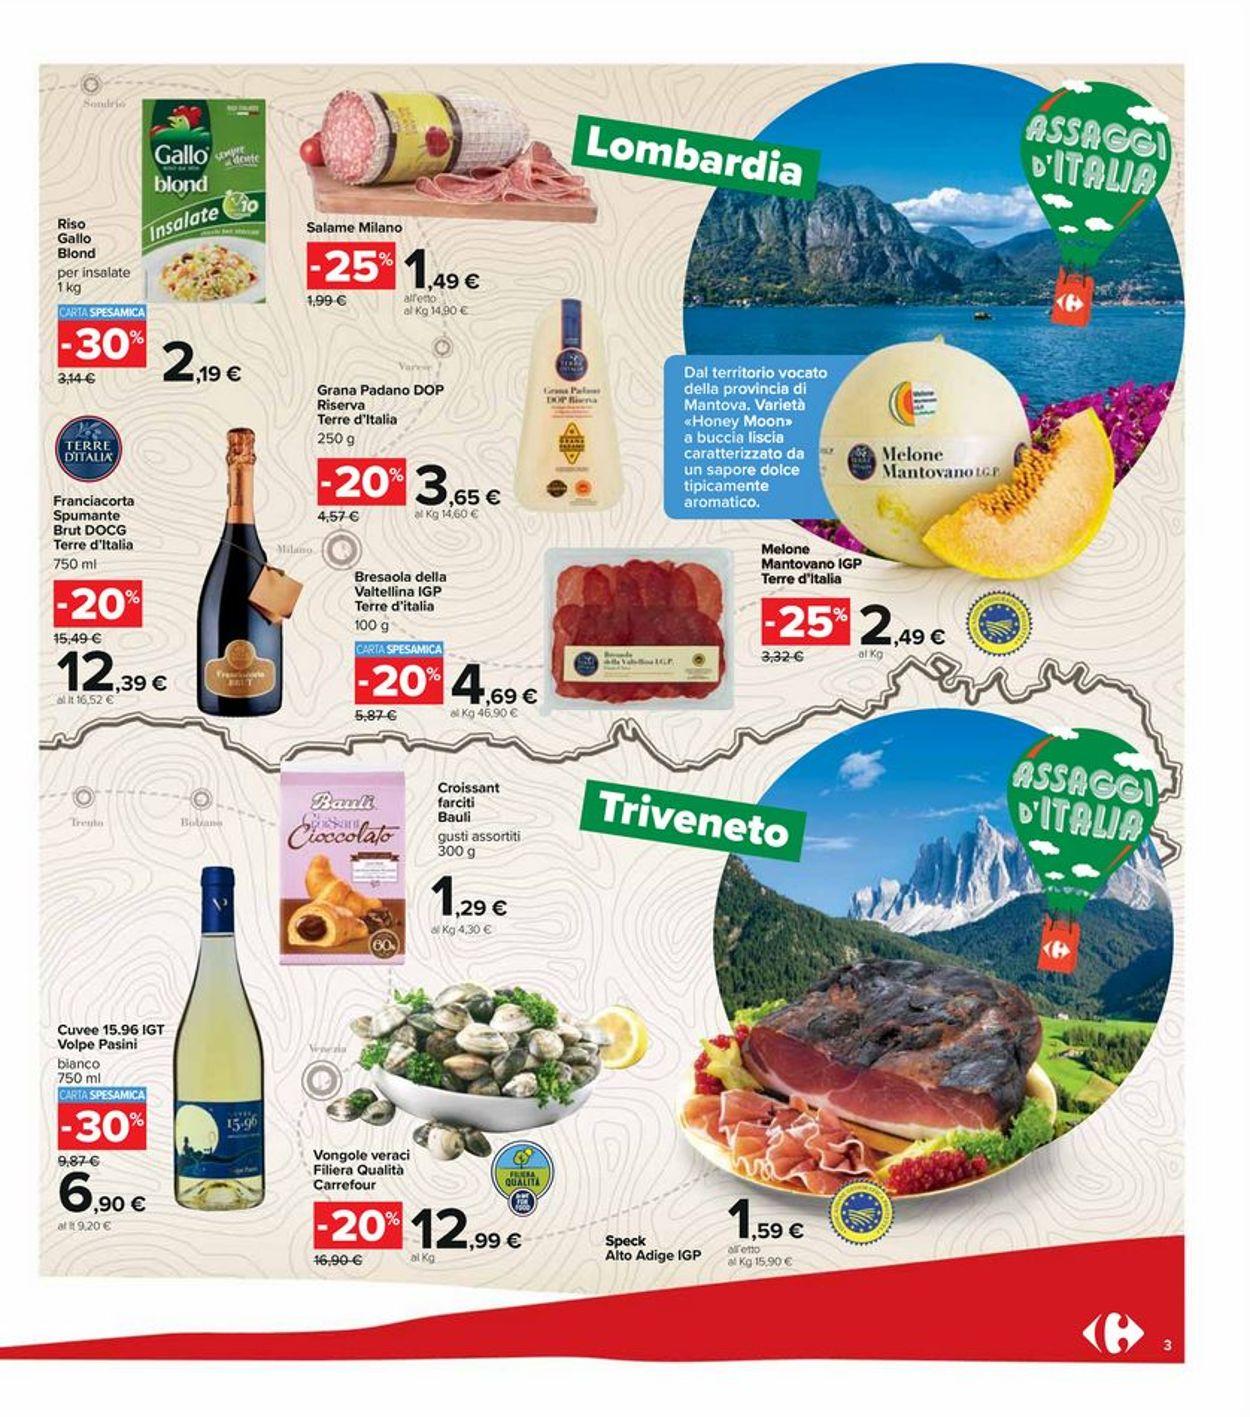 Volantino Carrefour - Offerte 17/06-30/06/2021 (Pagina 3)